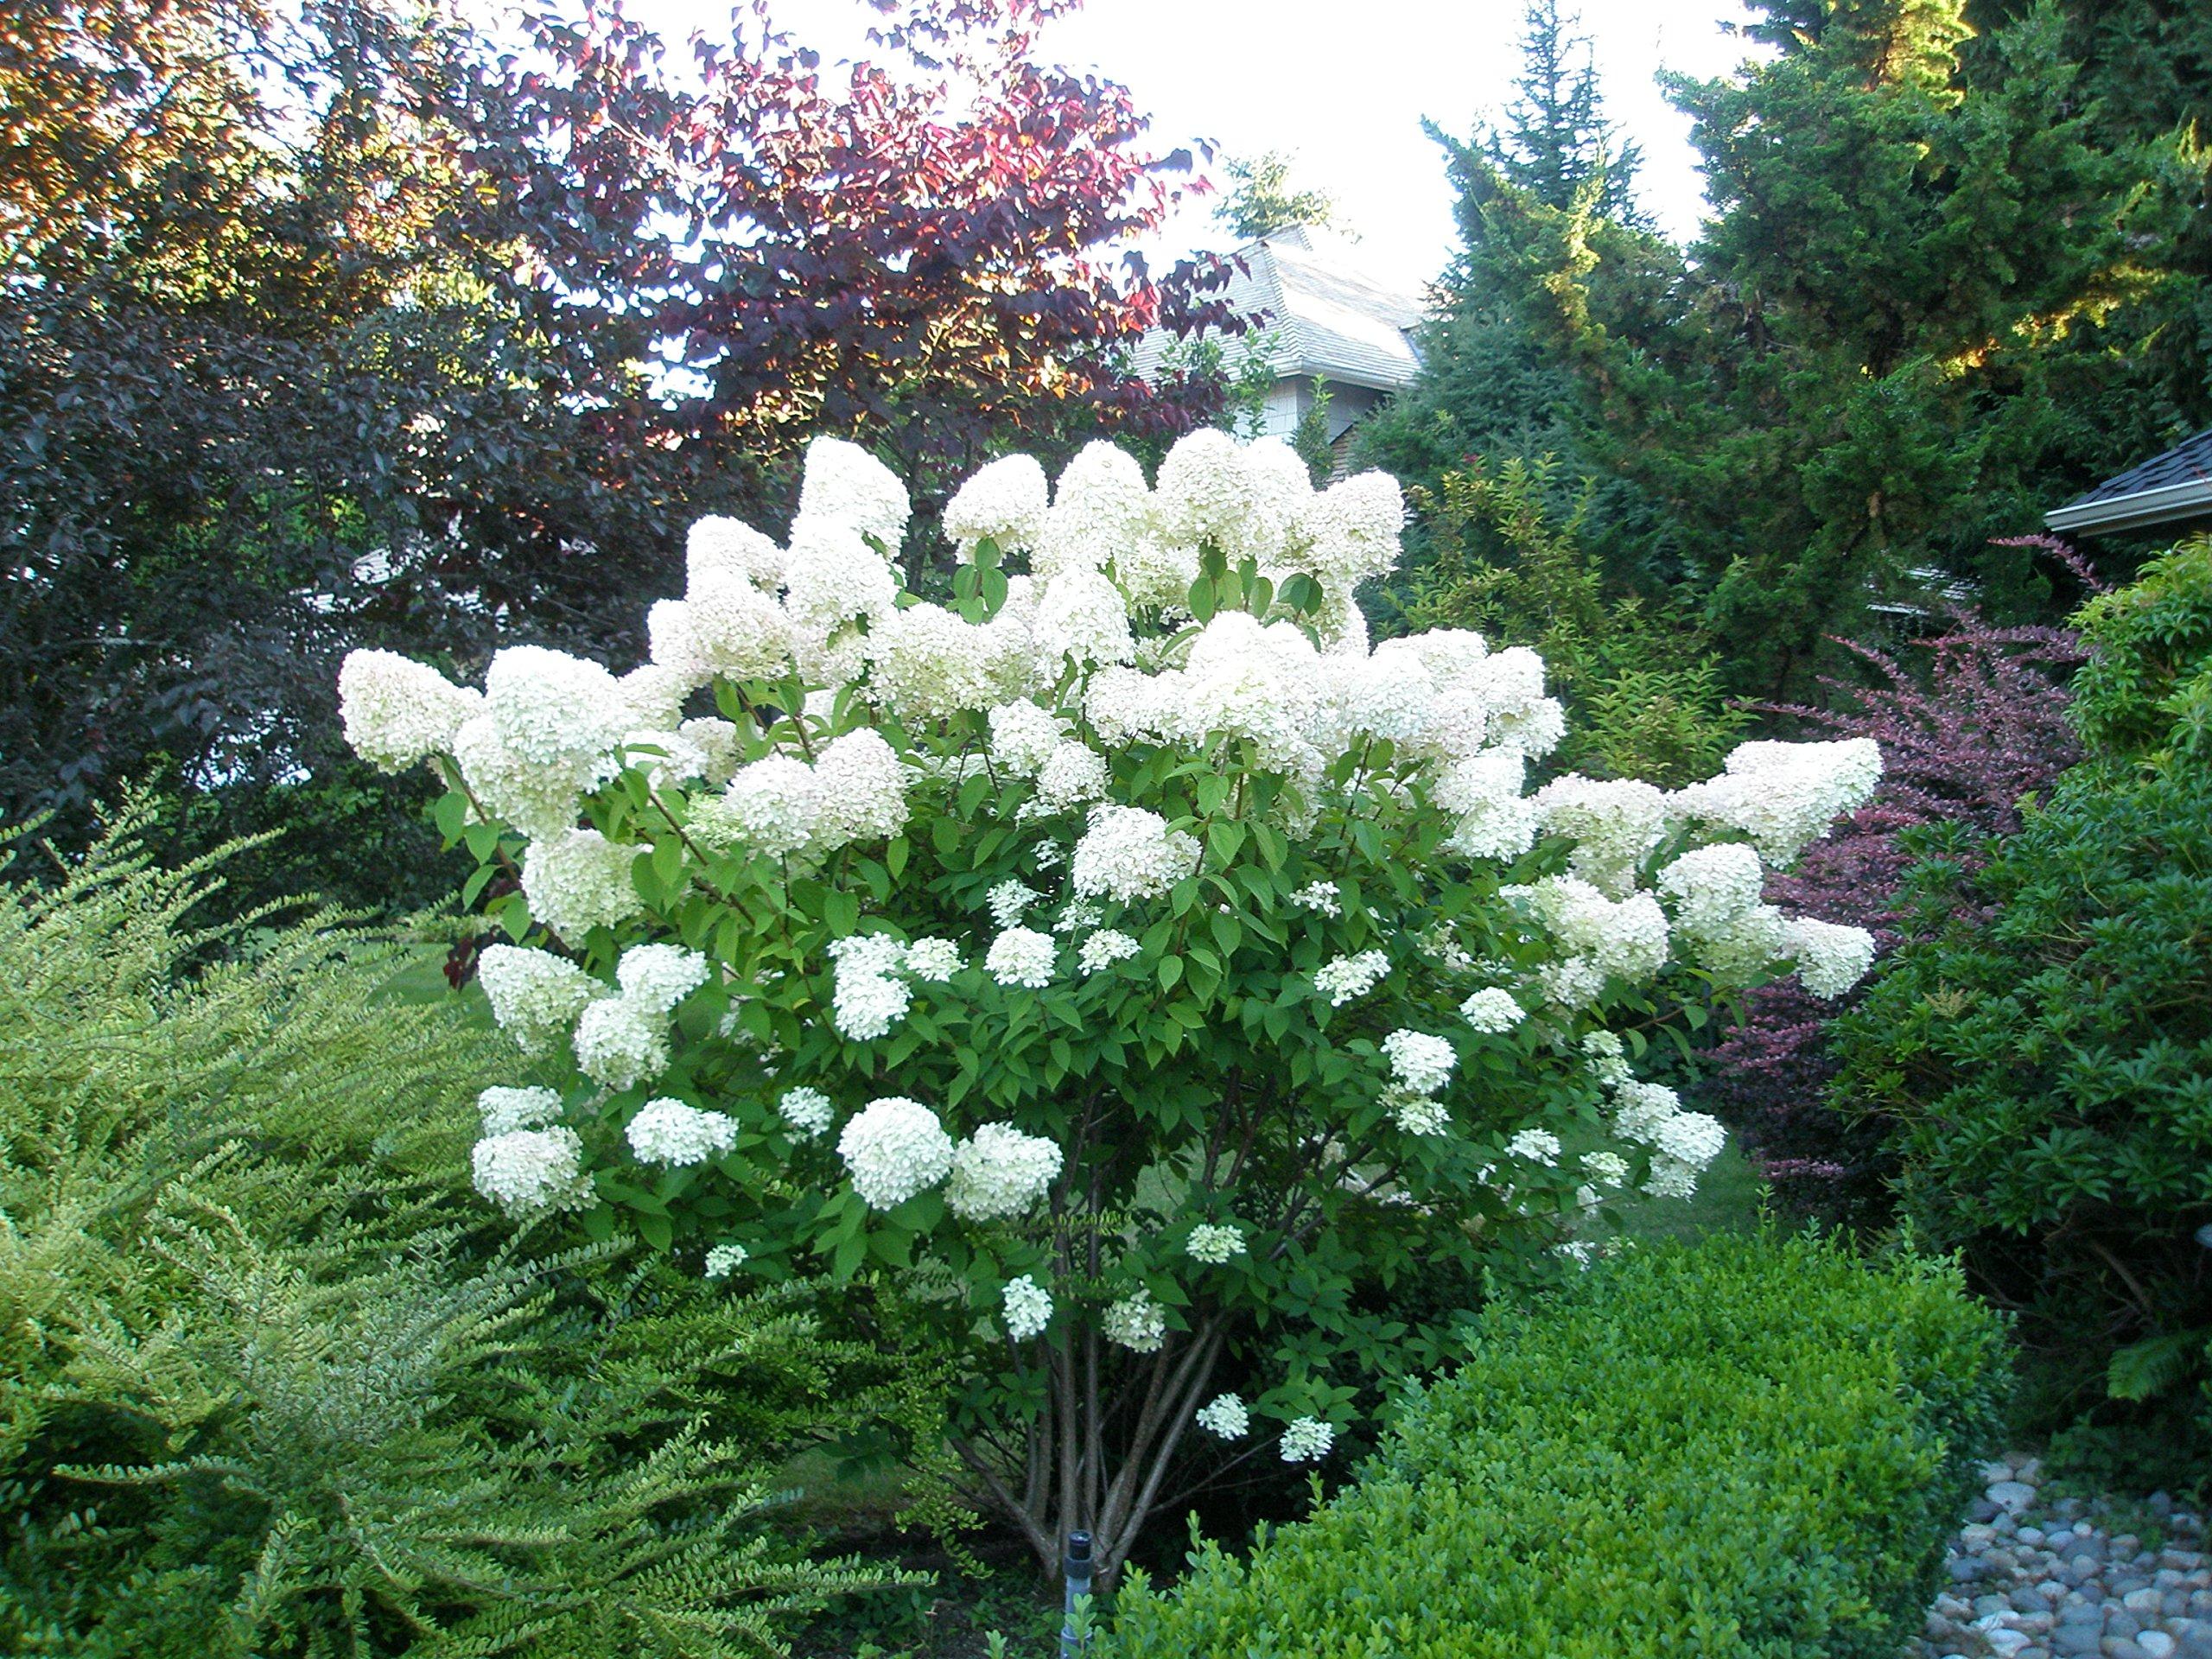 Limelight Hydrangea - Live Plants Shipped 1-2 Feet Tall by DAS Farms (No California)